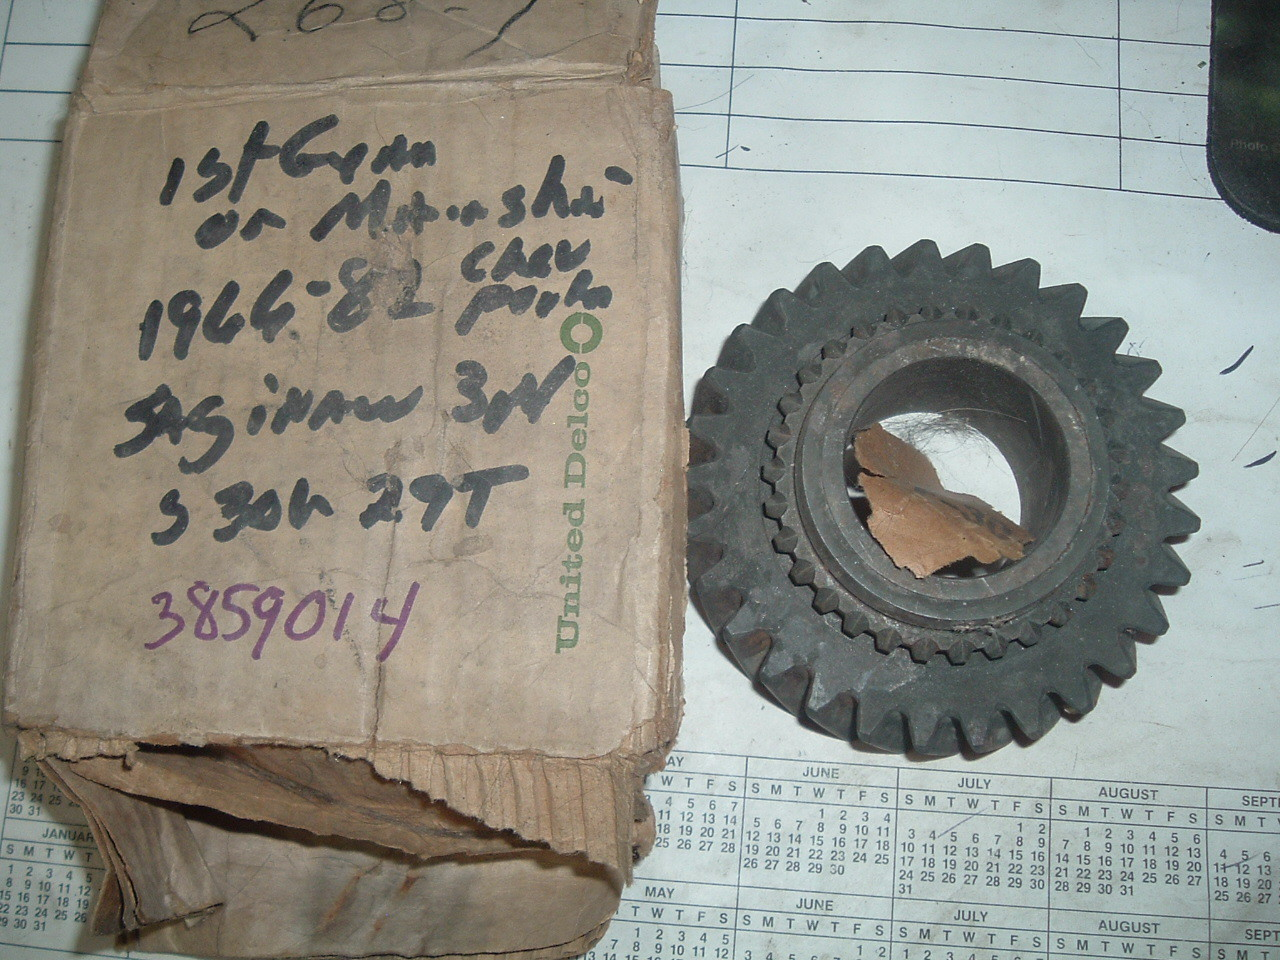 1966 68 70 72 74 75 chevrolet oldsmobile pontiac transmission gera nos gm 3859014 (z 3859014)